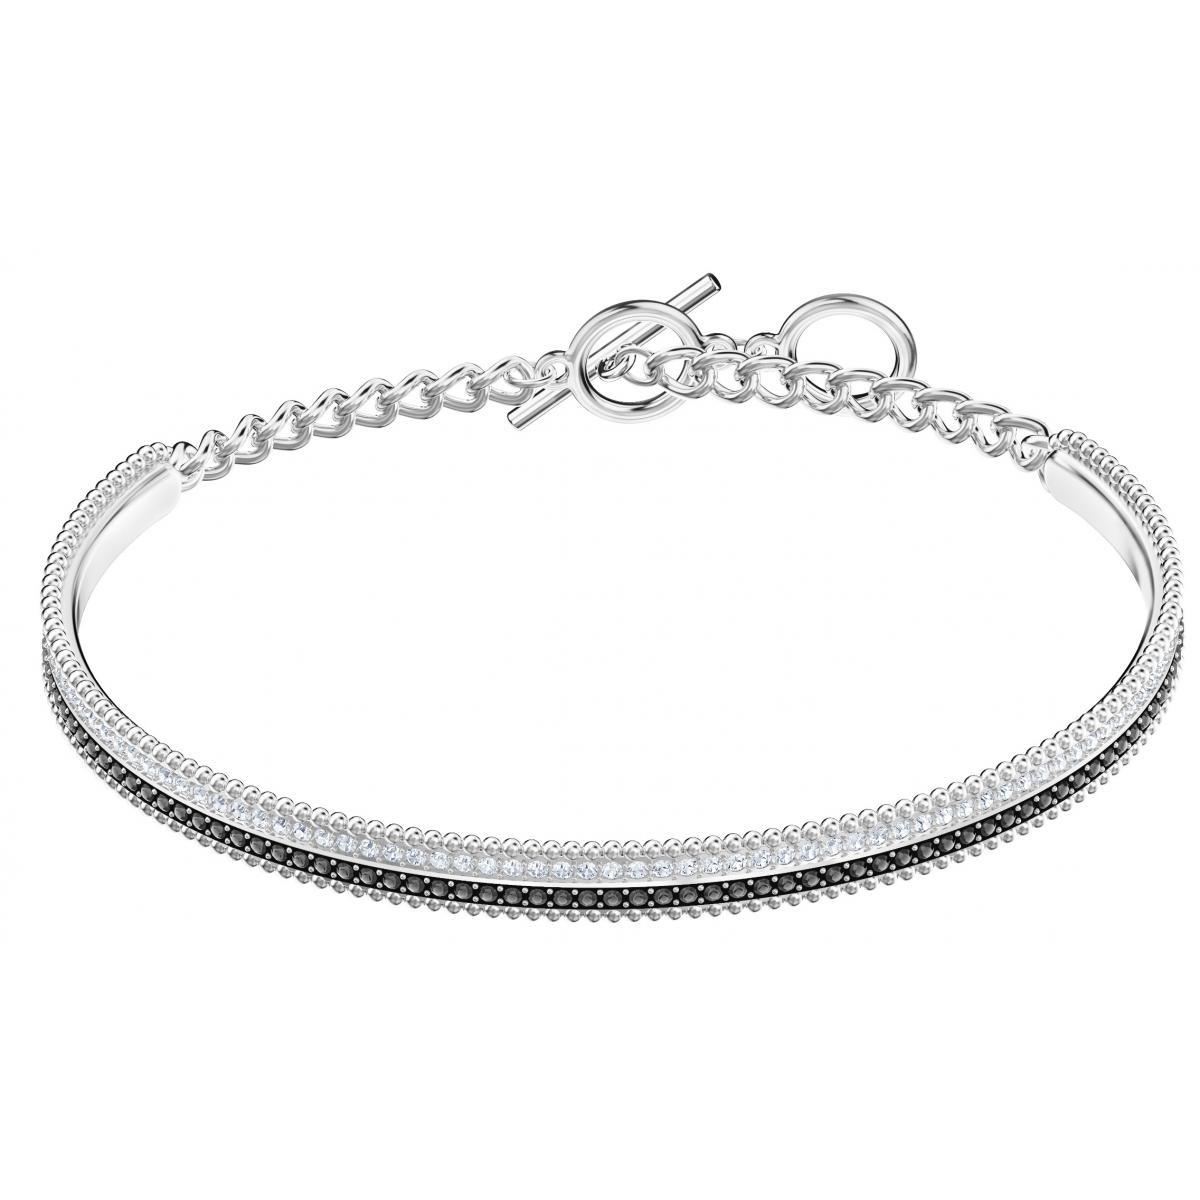 Bracelet Swarovski Bijoux 5424233 - Acier Argenté et Noir Cristaux  Swarovski Femme